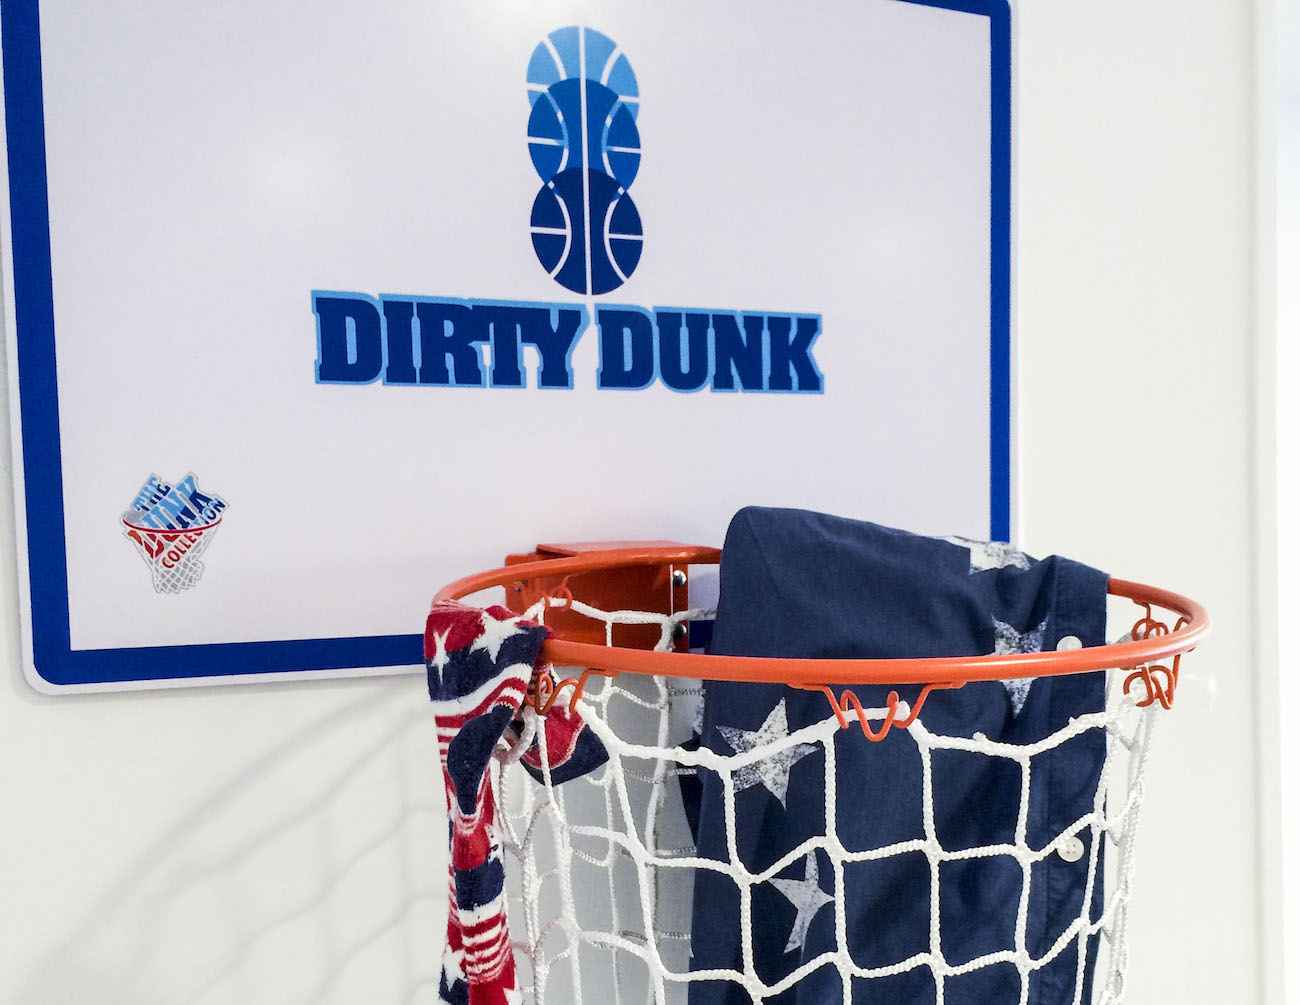 The Dirty Dunk – The Original Over-the-Door Basketball Hoop Laundry Hamper